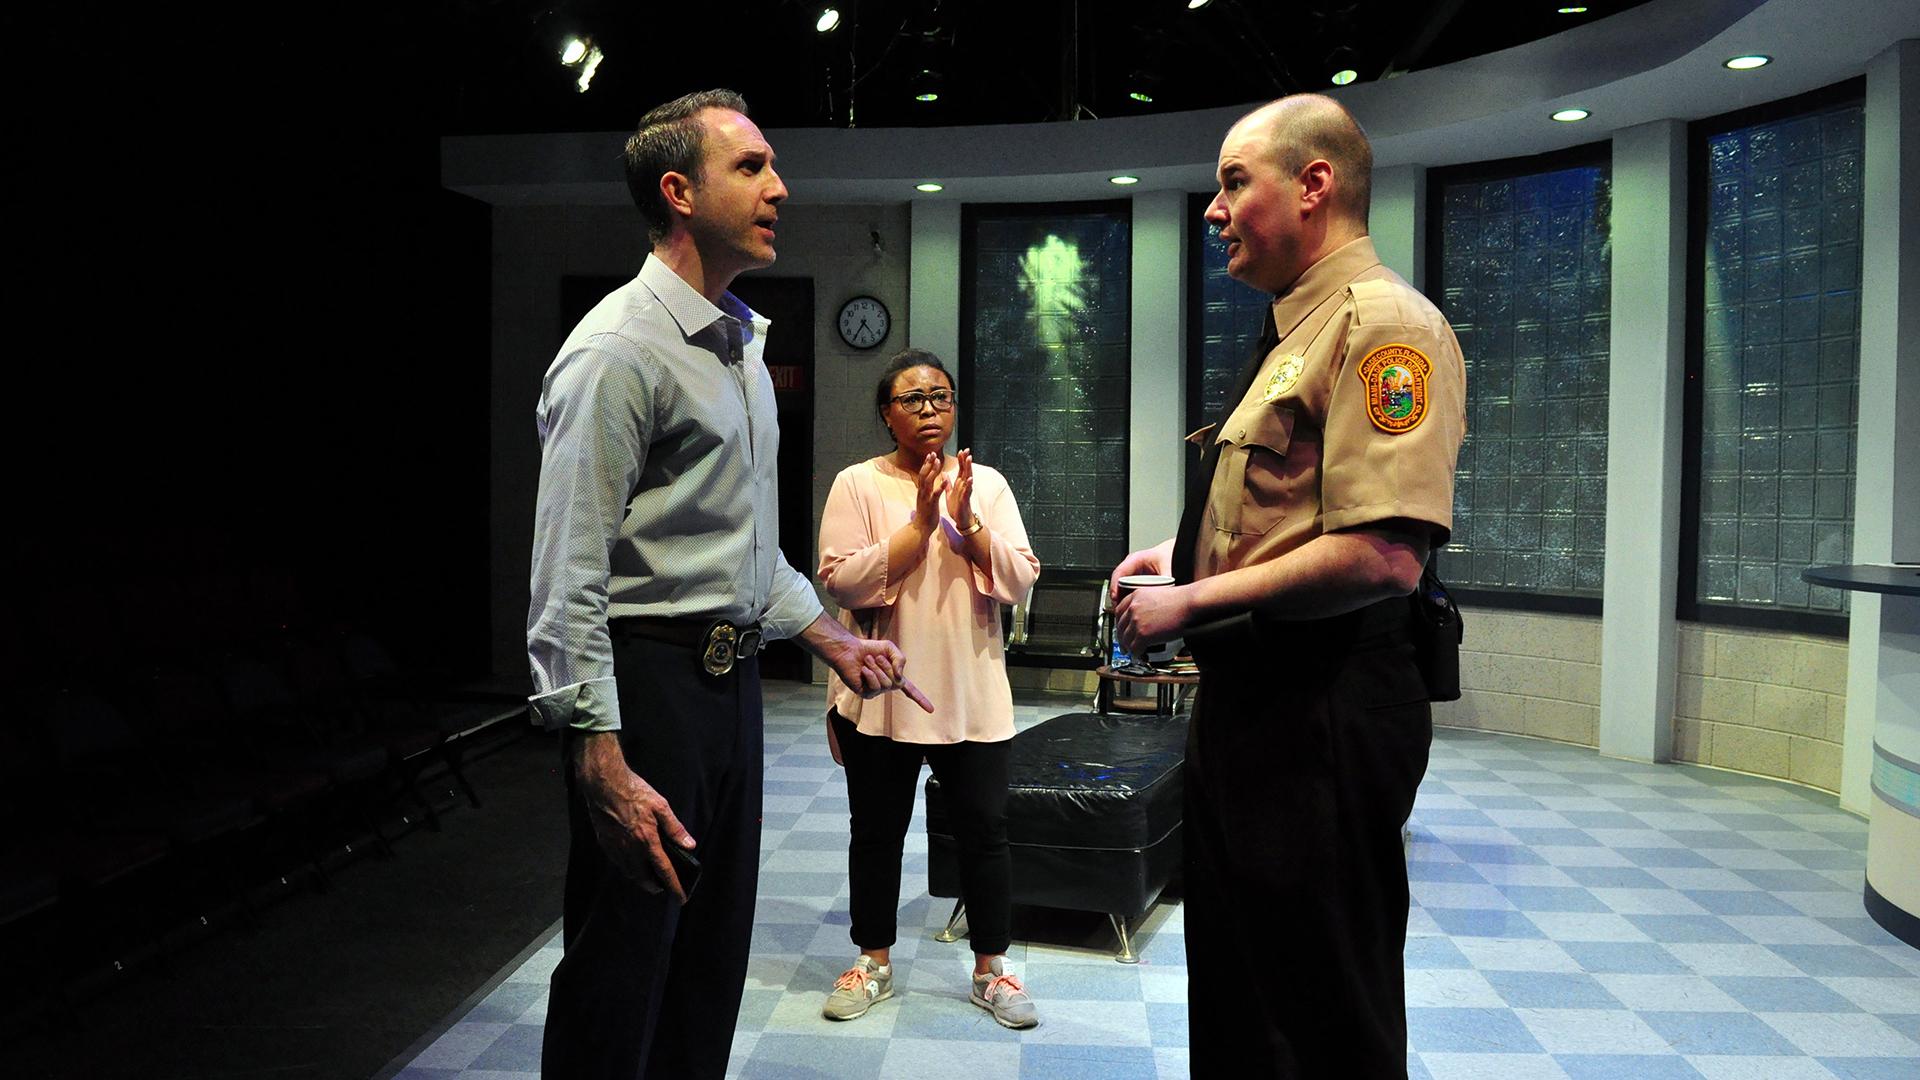 KC Performing Arts See Uncertain Future Amid COVID-19 Lockdown